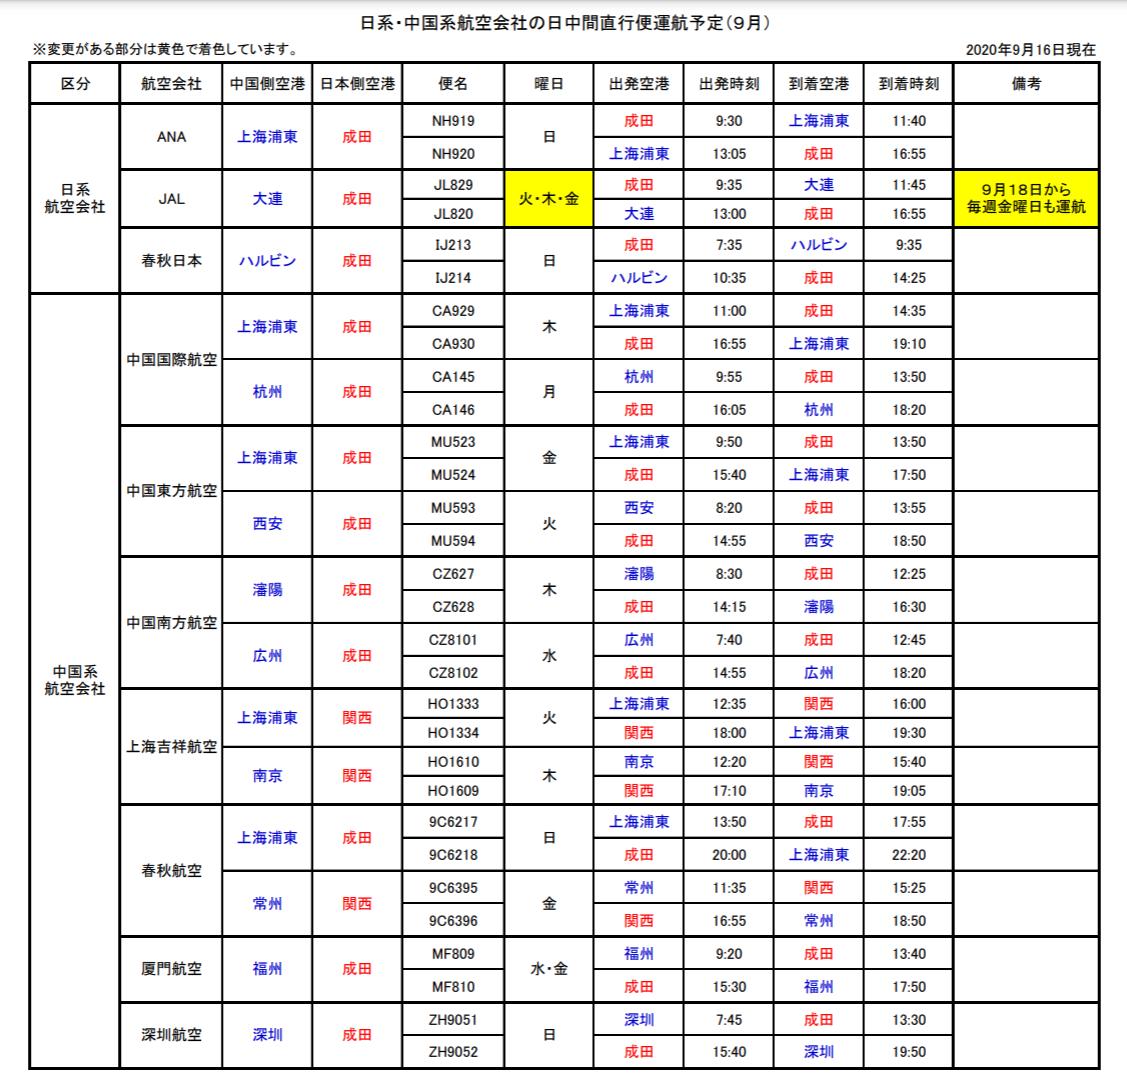 f:id:chachan-china:20200918063700p:plain